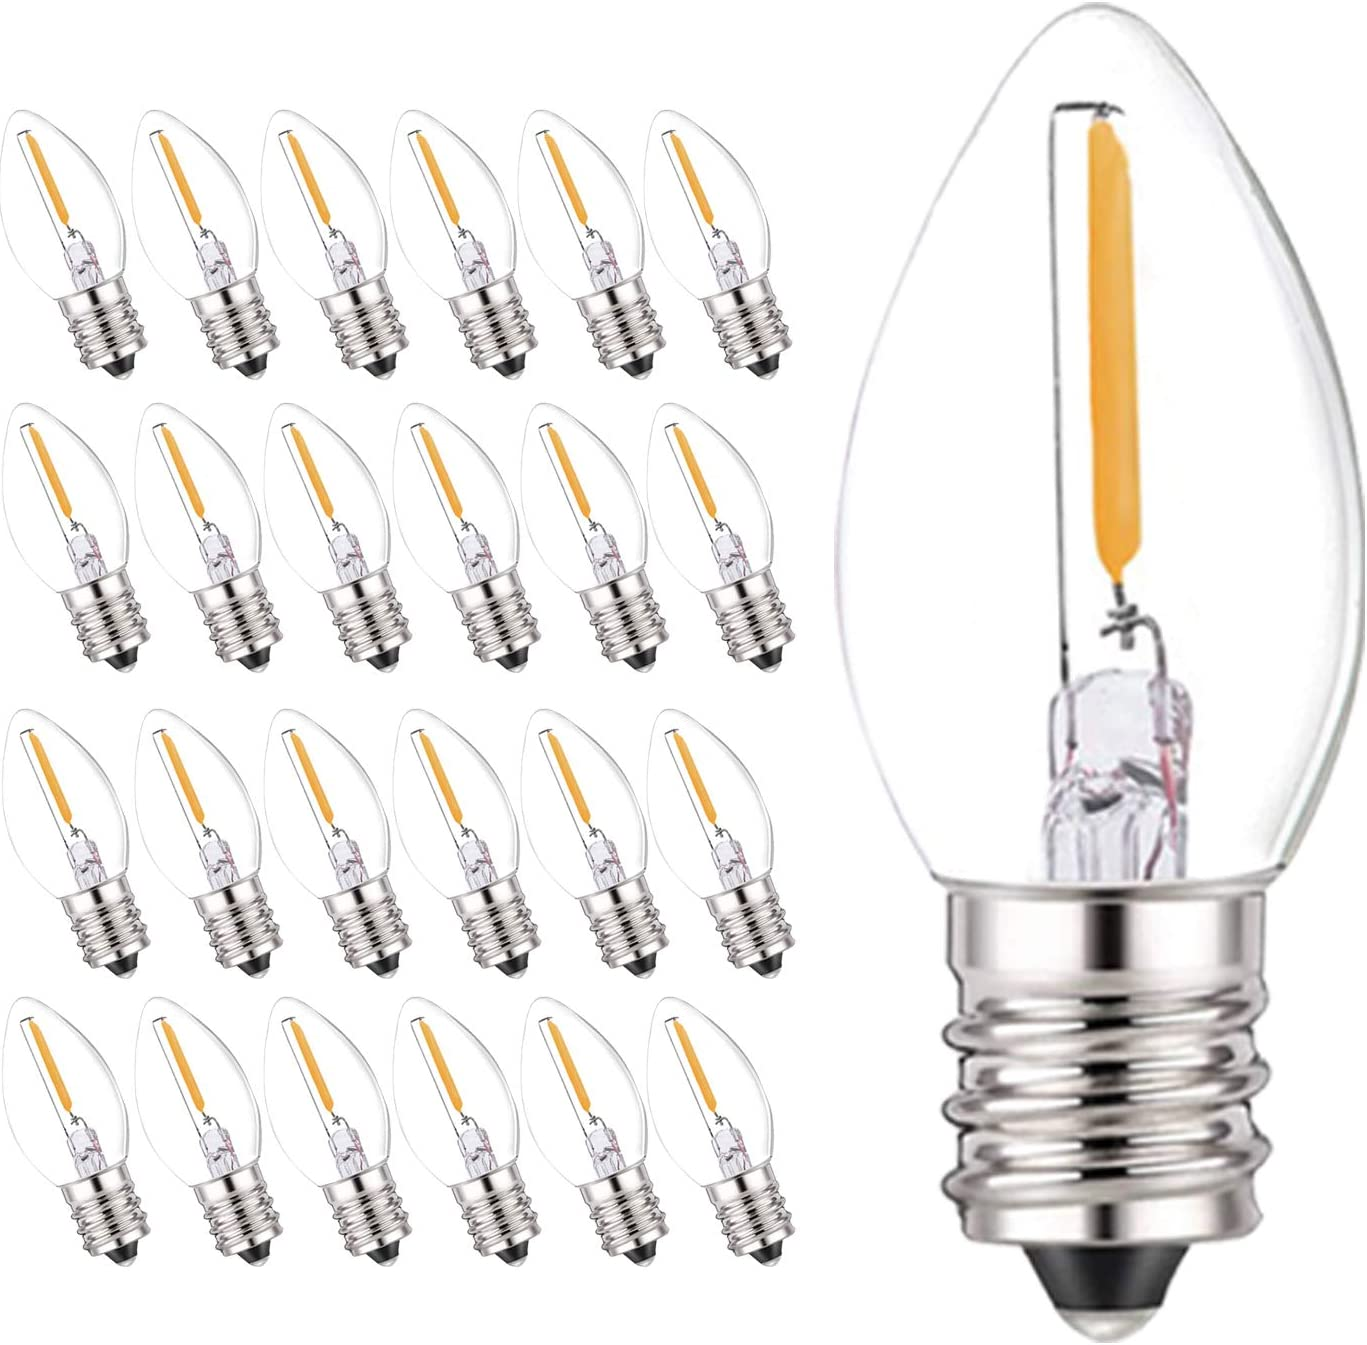 25 free Pack C7 LED Bulbs 0.5 Filament Night Edi Watts Bulb Deluxe Light